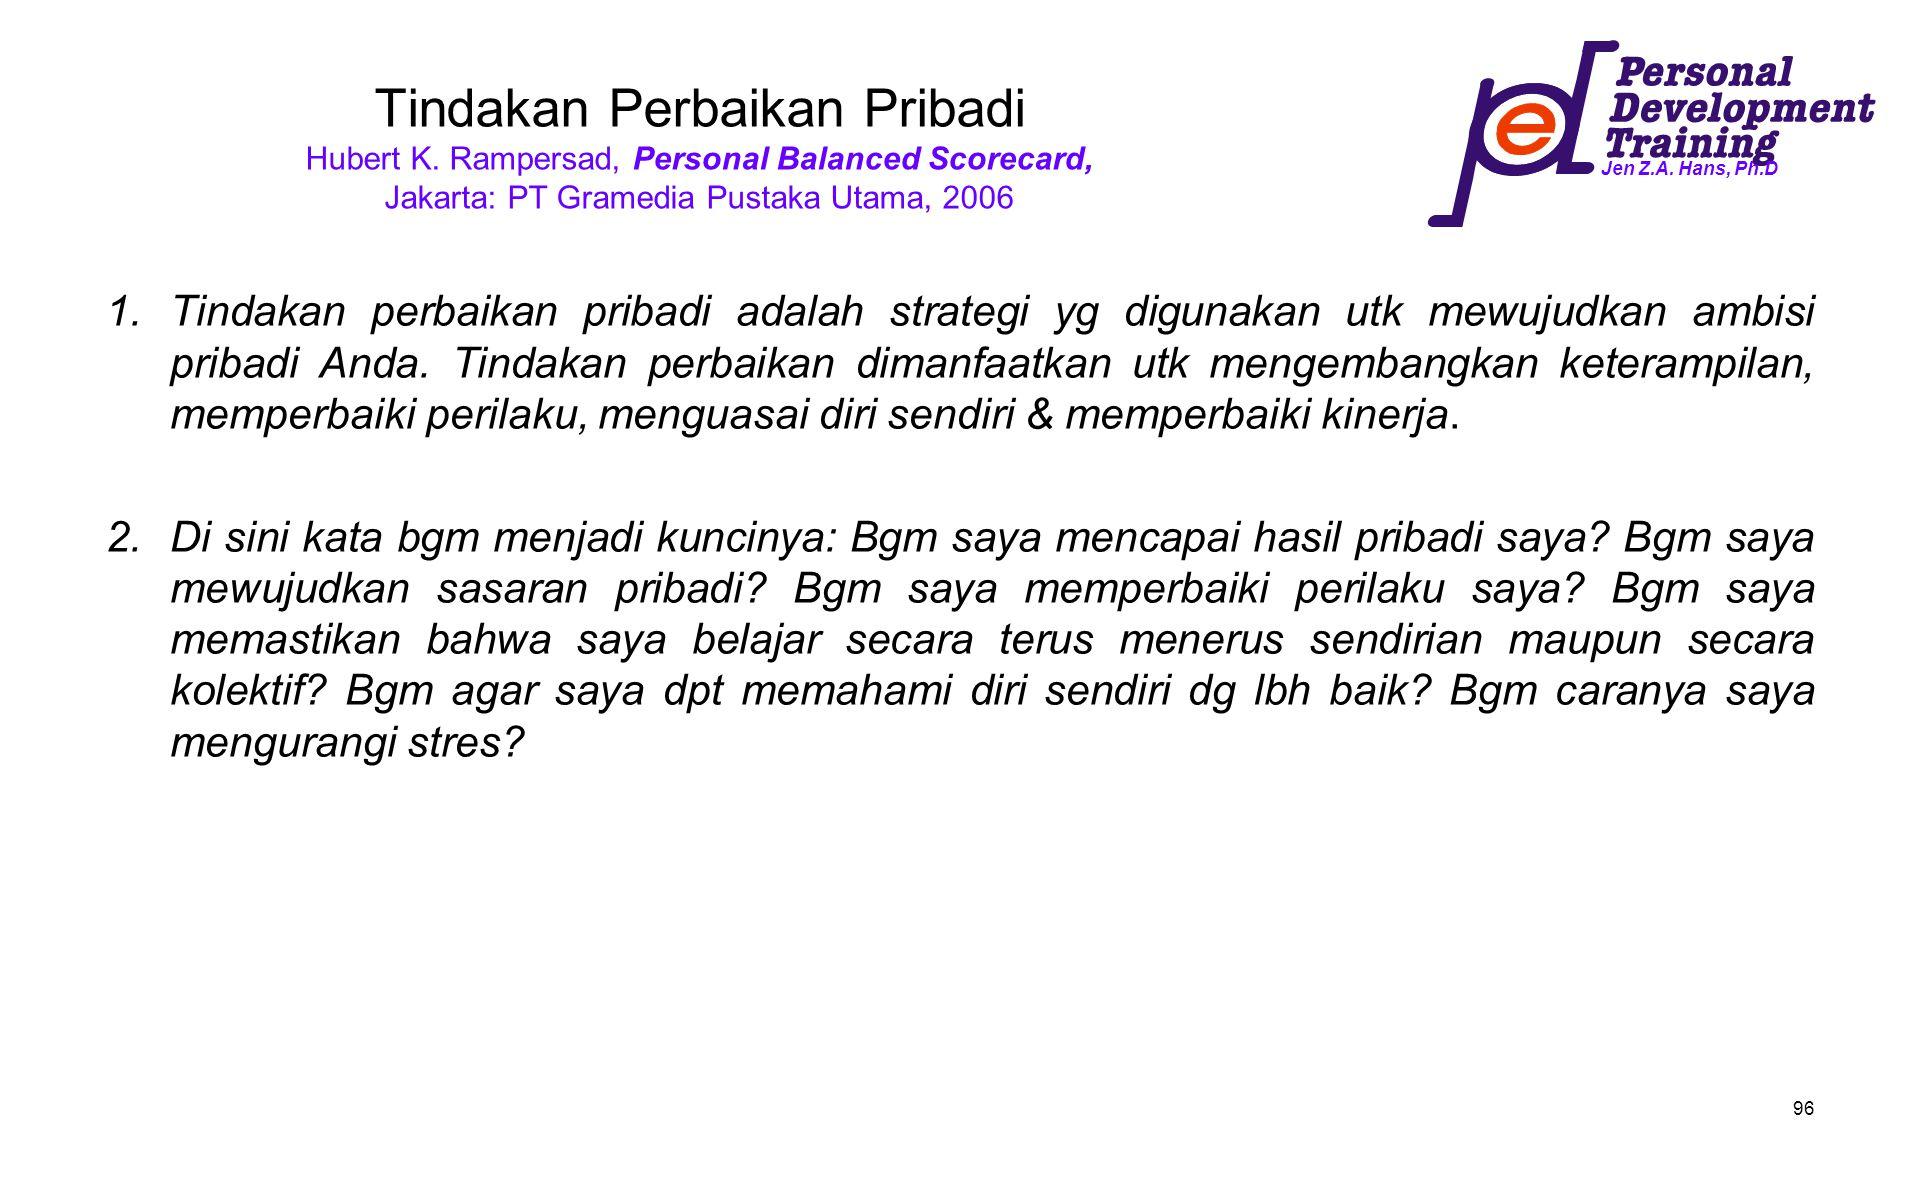 Jen Z.A. Hans, Ph.D 96 Tindakan Perbaikan Pribadi Hubert K. Rampersad, Personal Balanced Scorecard, Jakarta: PT Gramedia Pustaka Utama, 2006 1.Tindaka